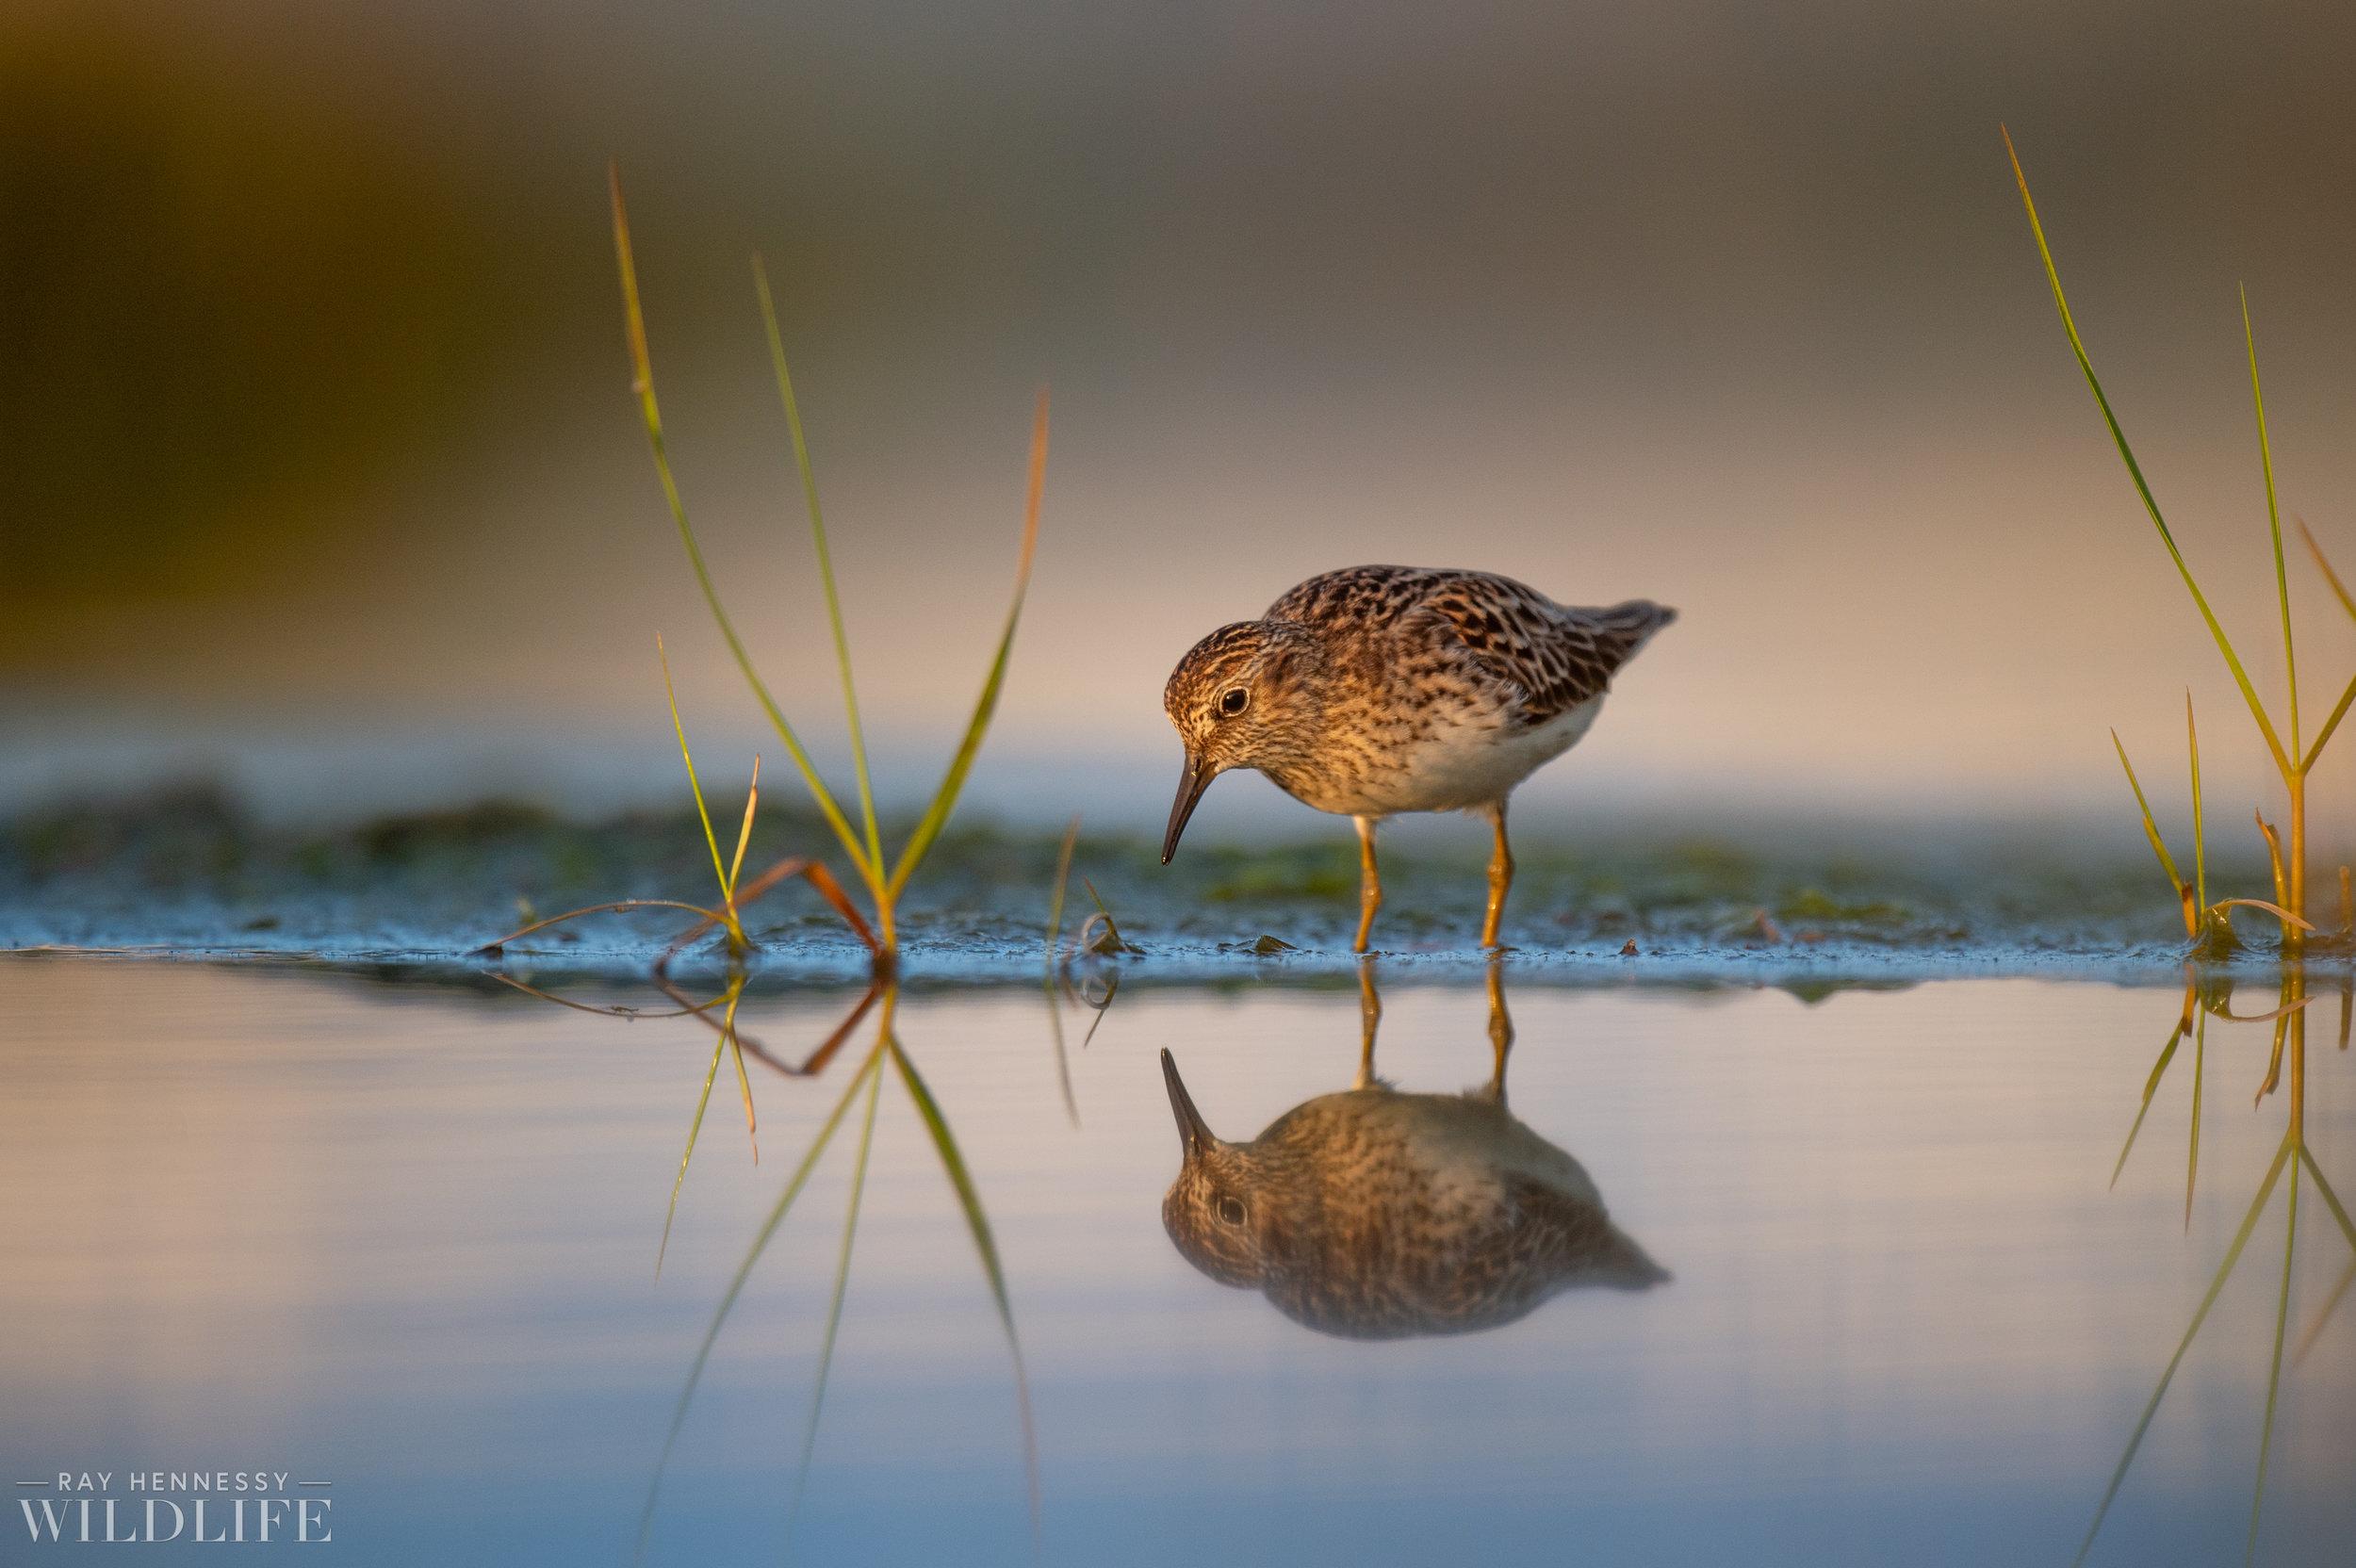 005_shorebirds-prothonotary-warbler.jpg